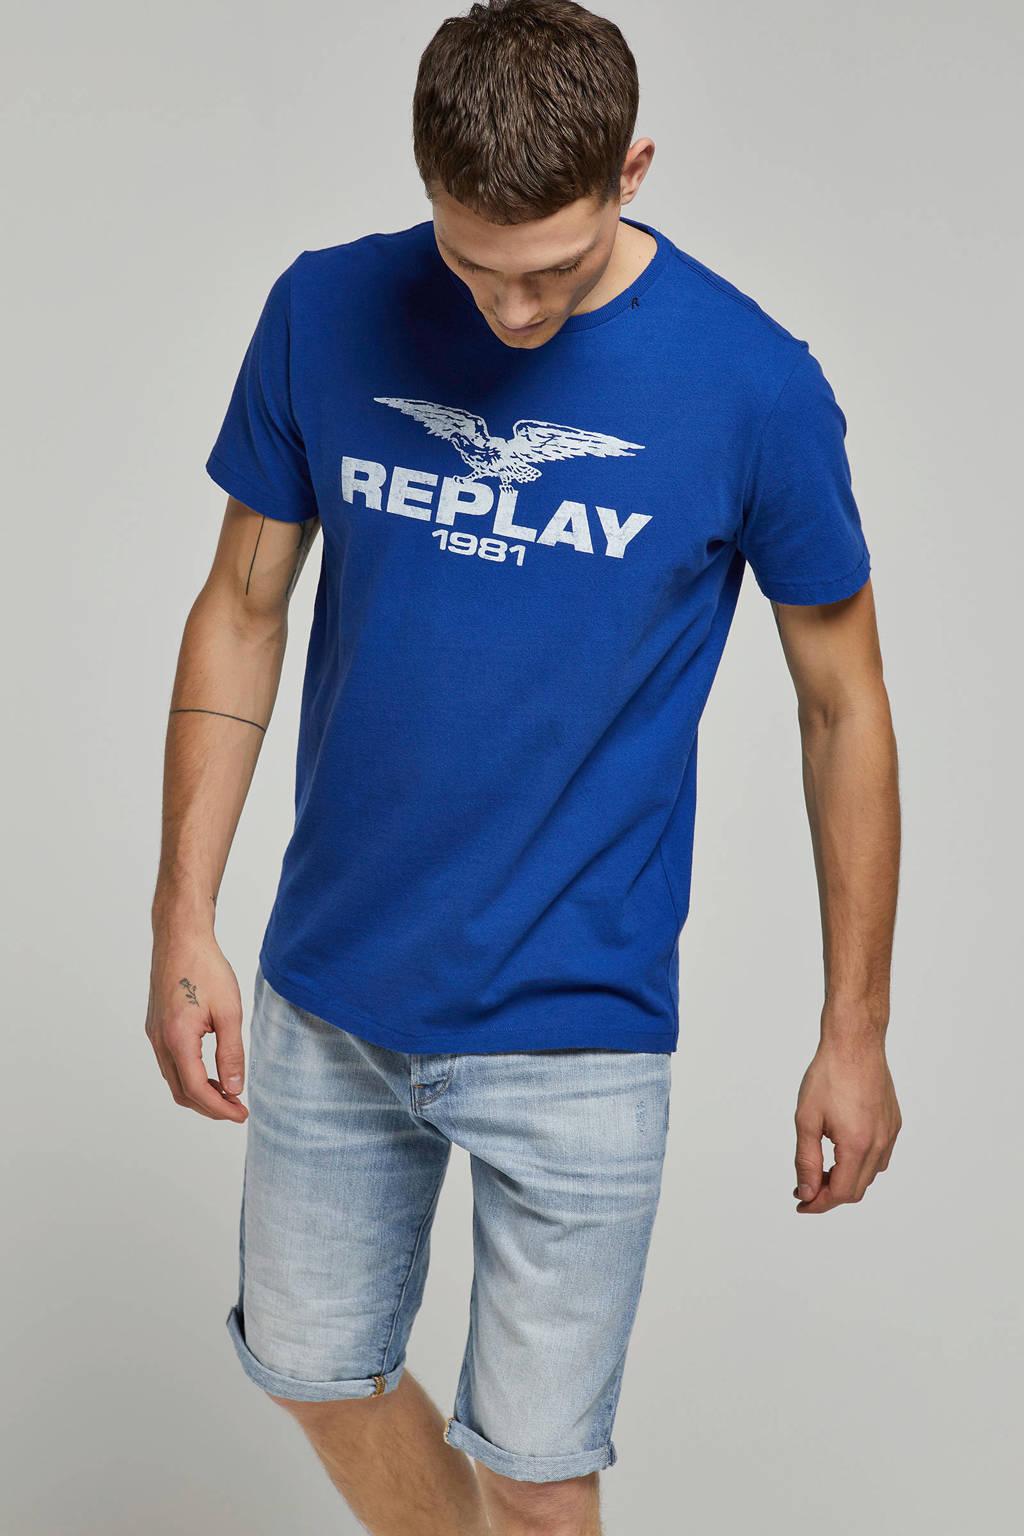 REPLAY T-shirt met logo, Blauw